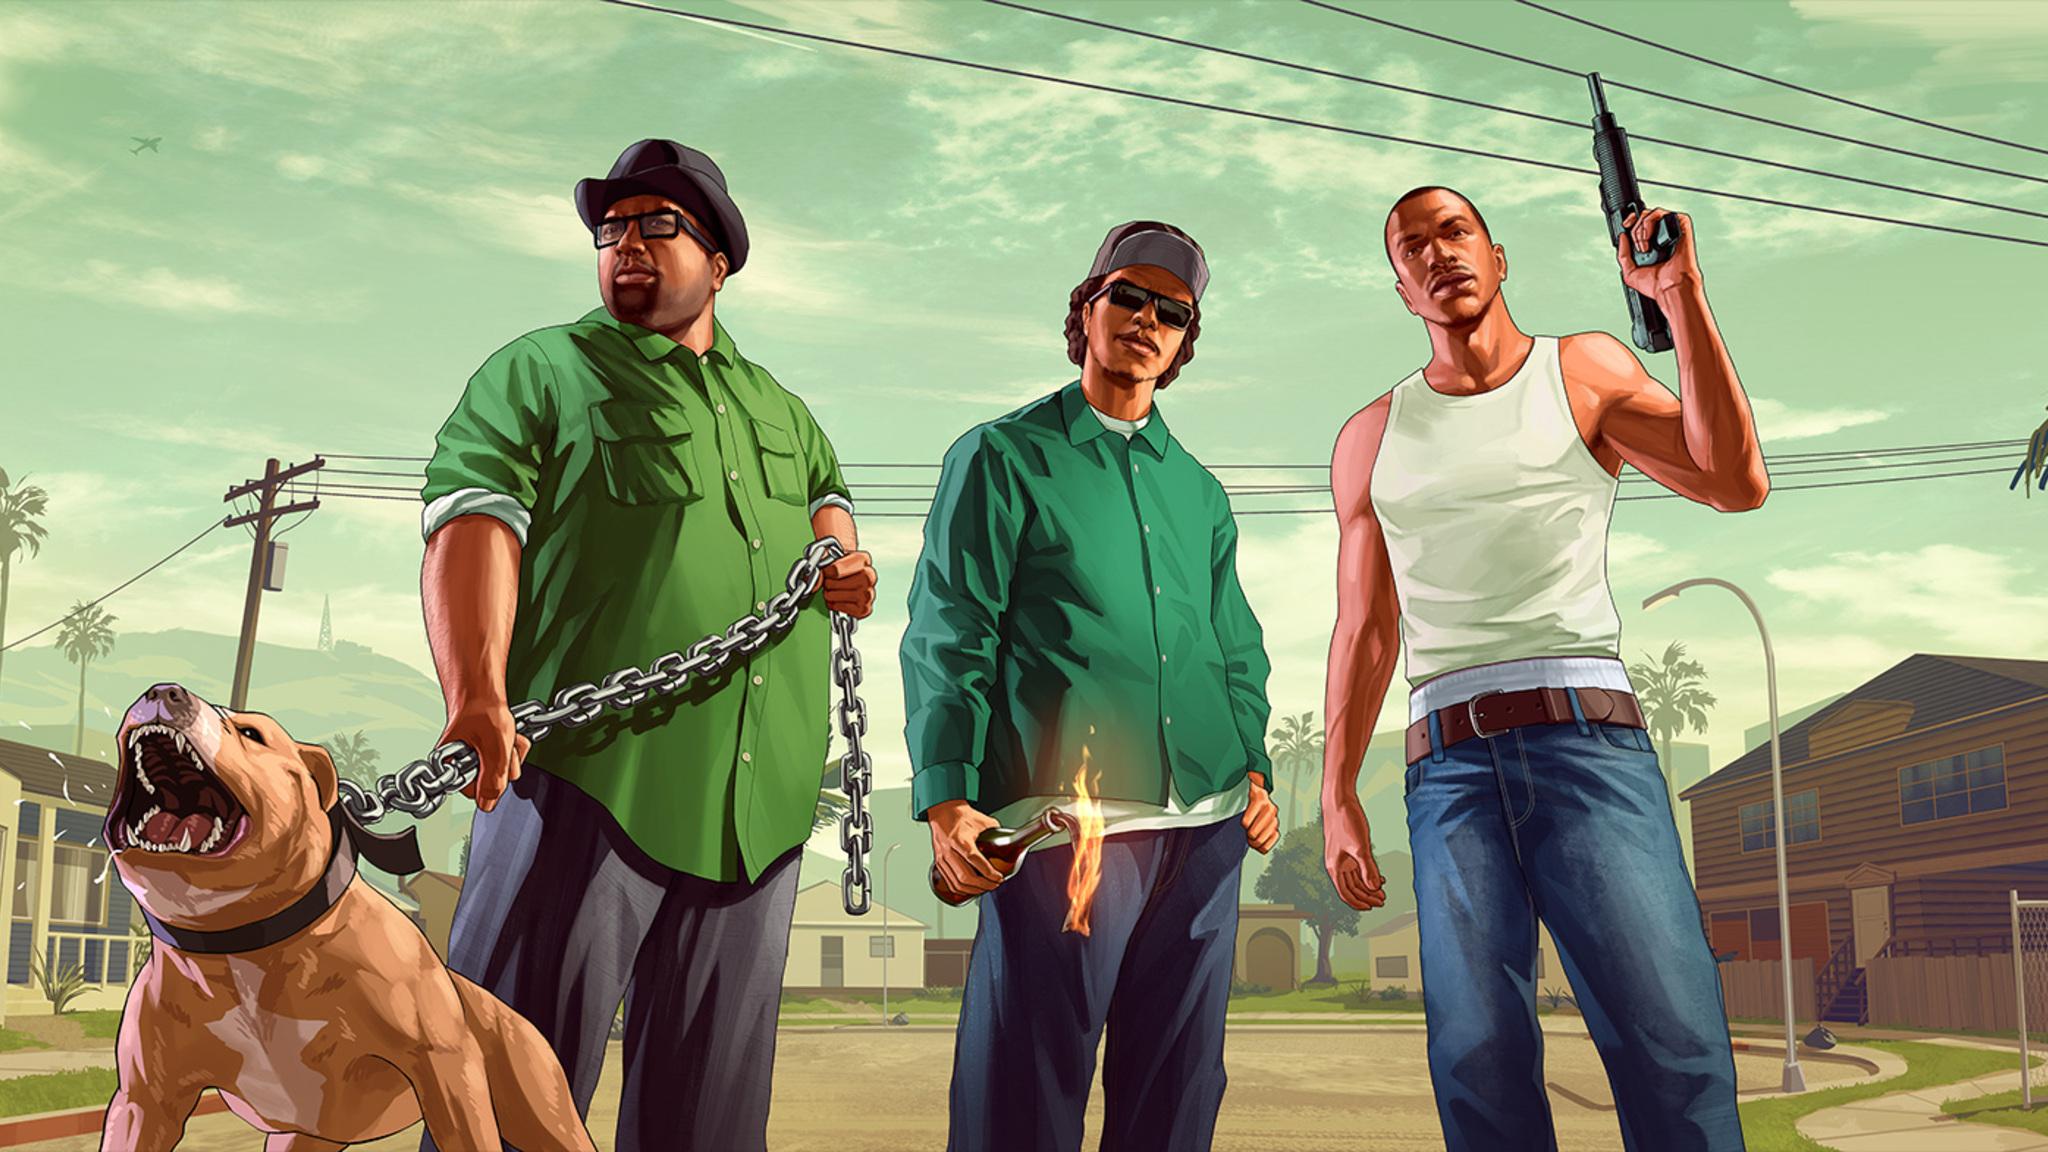 2048x1152 Grand Theft Auto San Andreas Fanart 2048x1152